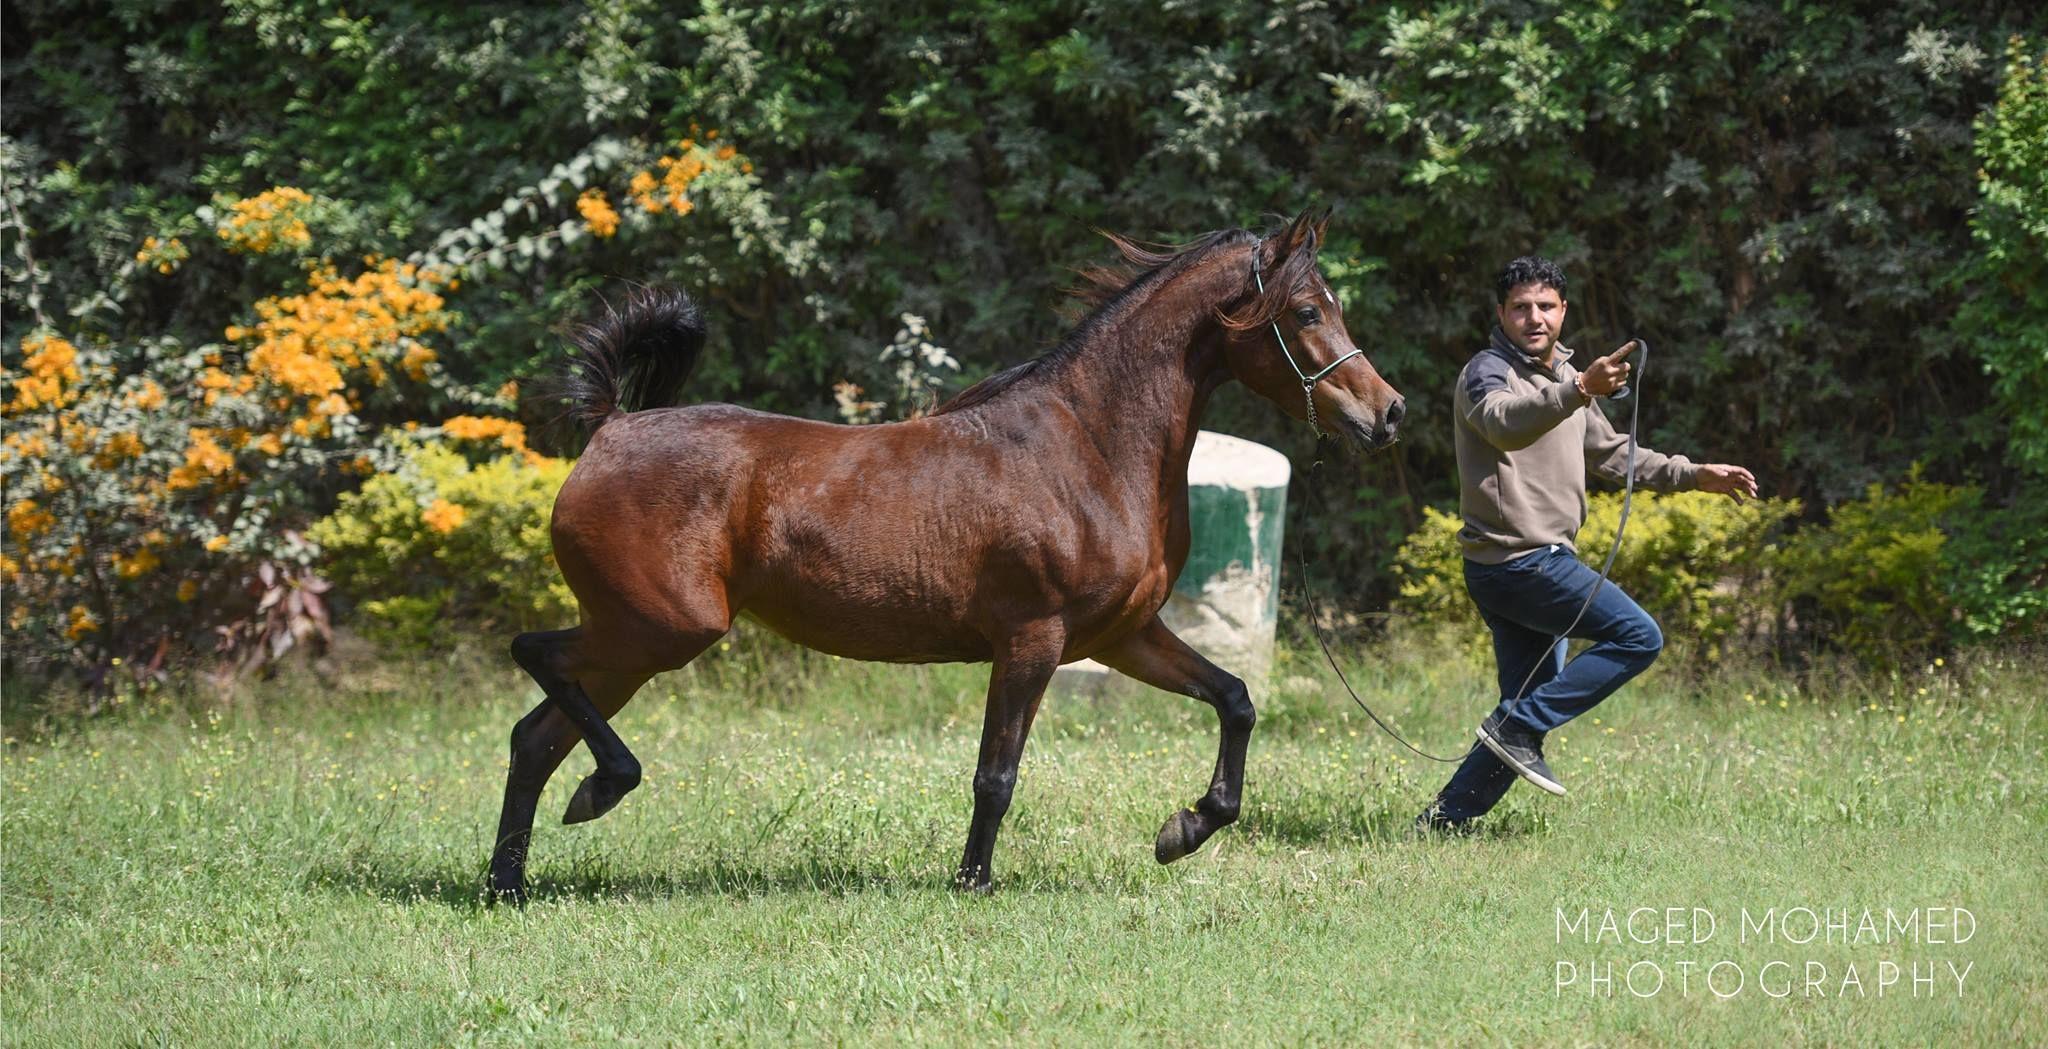 Wada Ah Omayerah X Defaf Date Of Birth Jan 25 2015 Dahman وداعة ضفاف عميرة تاريخ الميلاد 25 يناير 2015 دهمان Horses Animals April 11